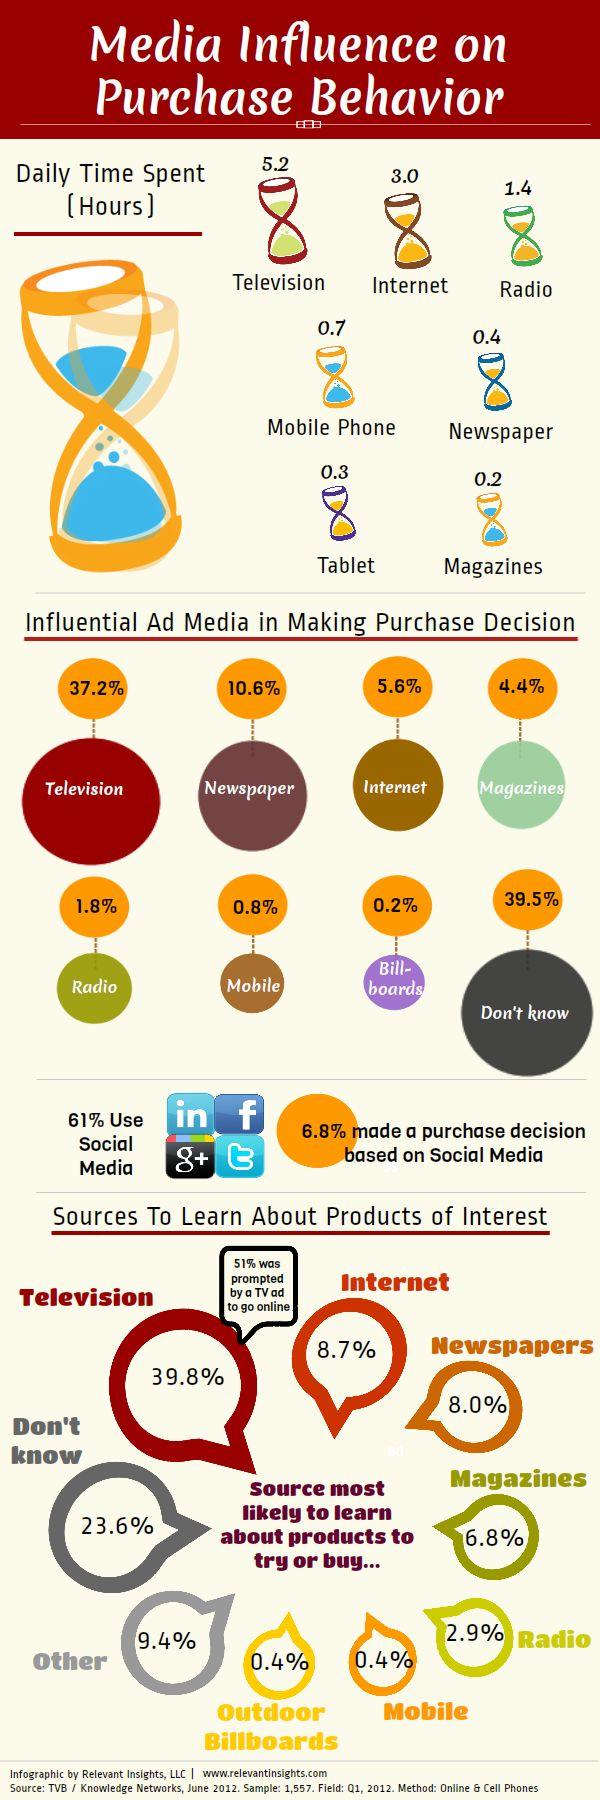 Media Influence on Purchase Behavior